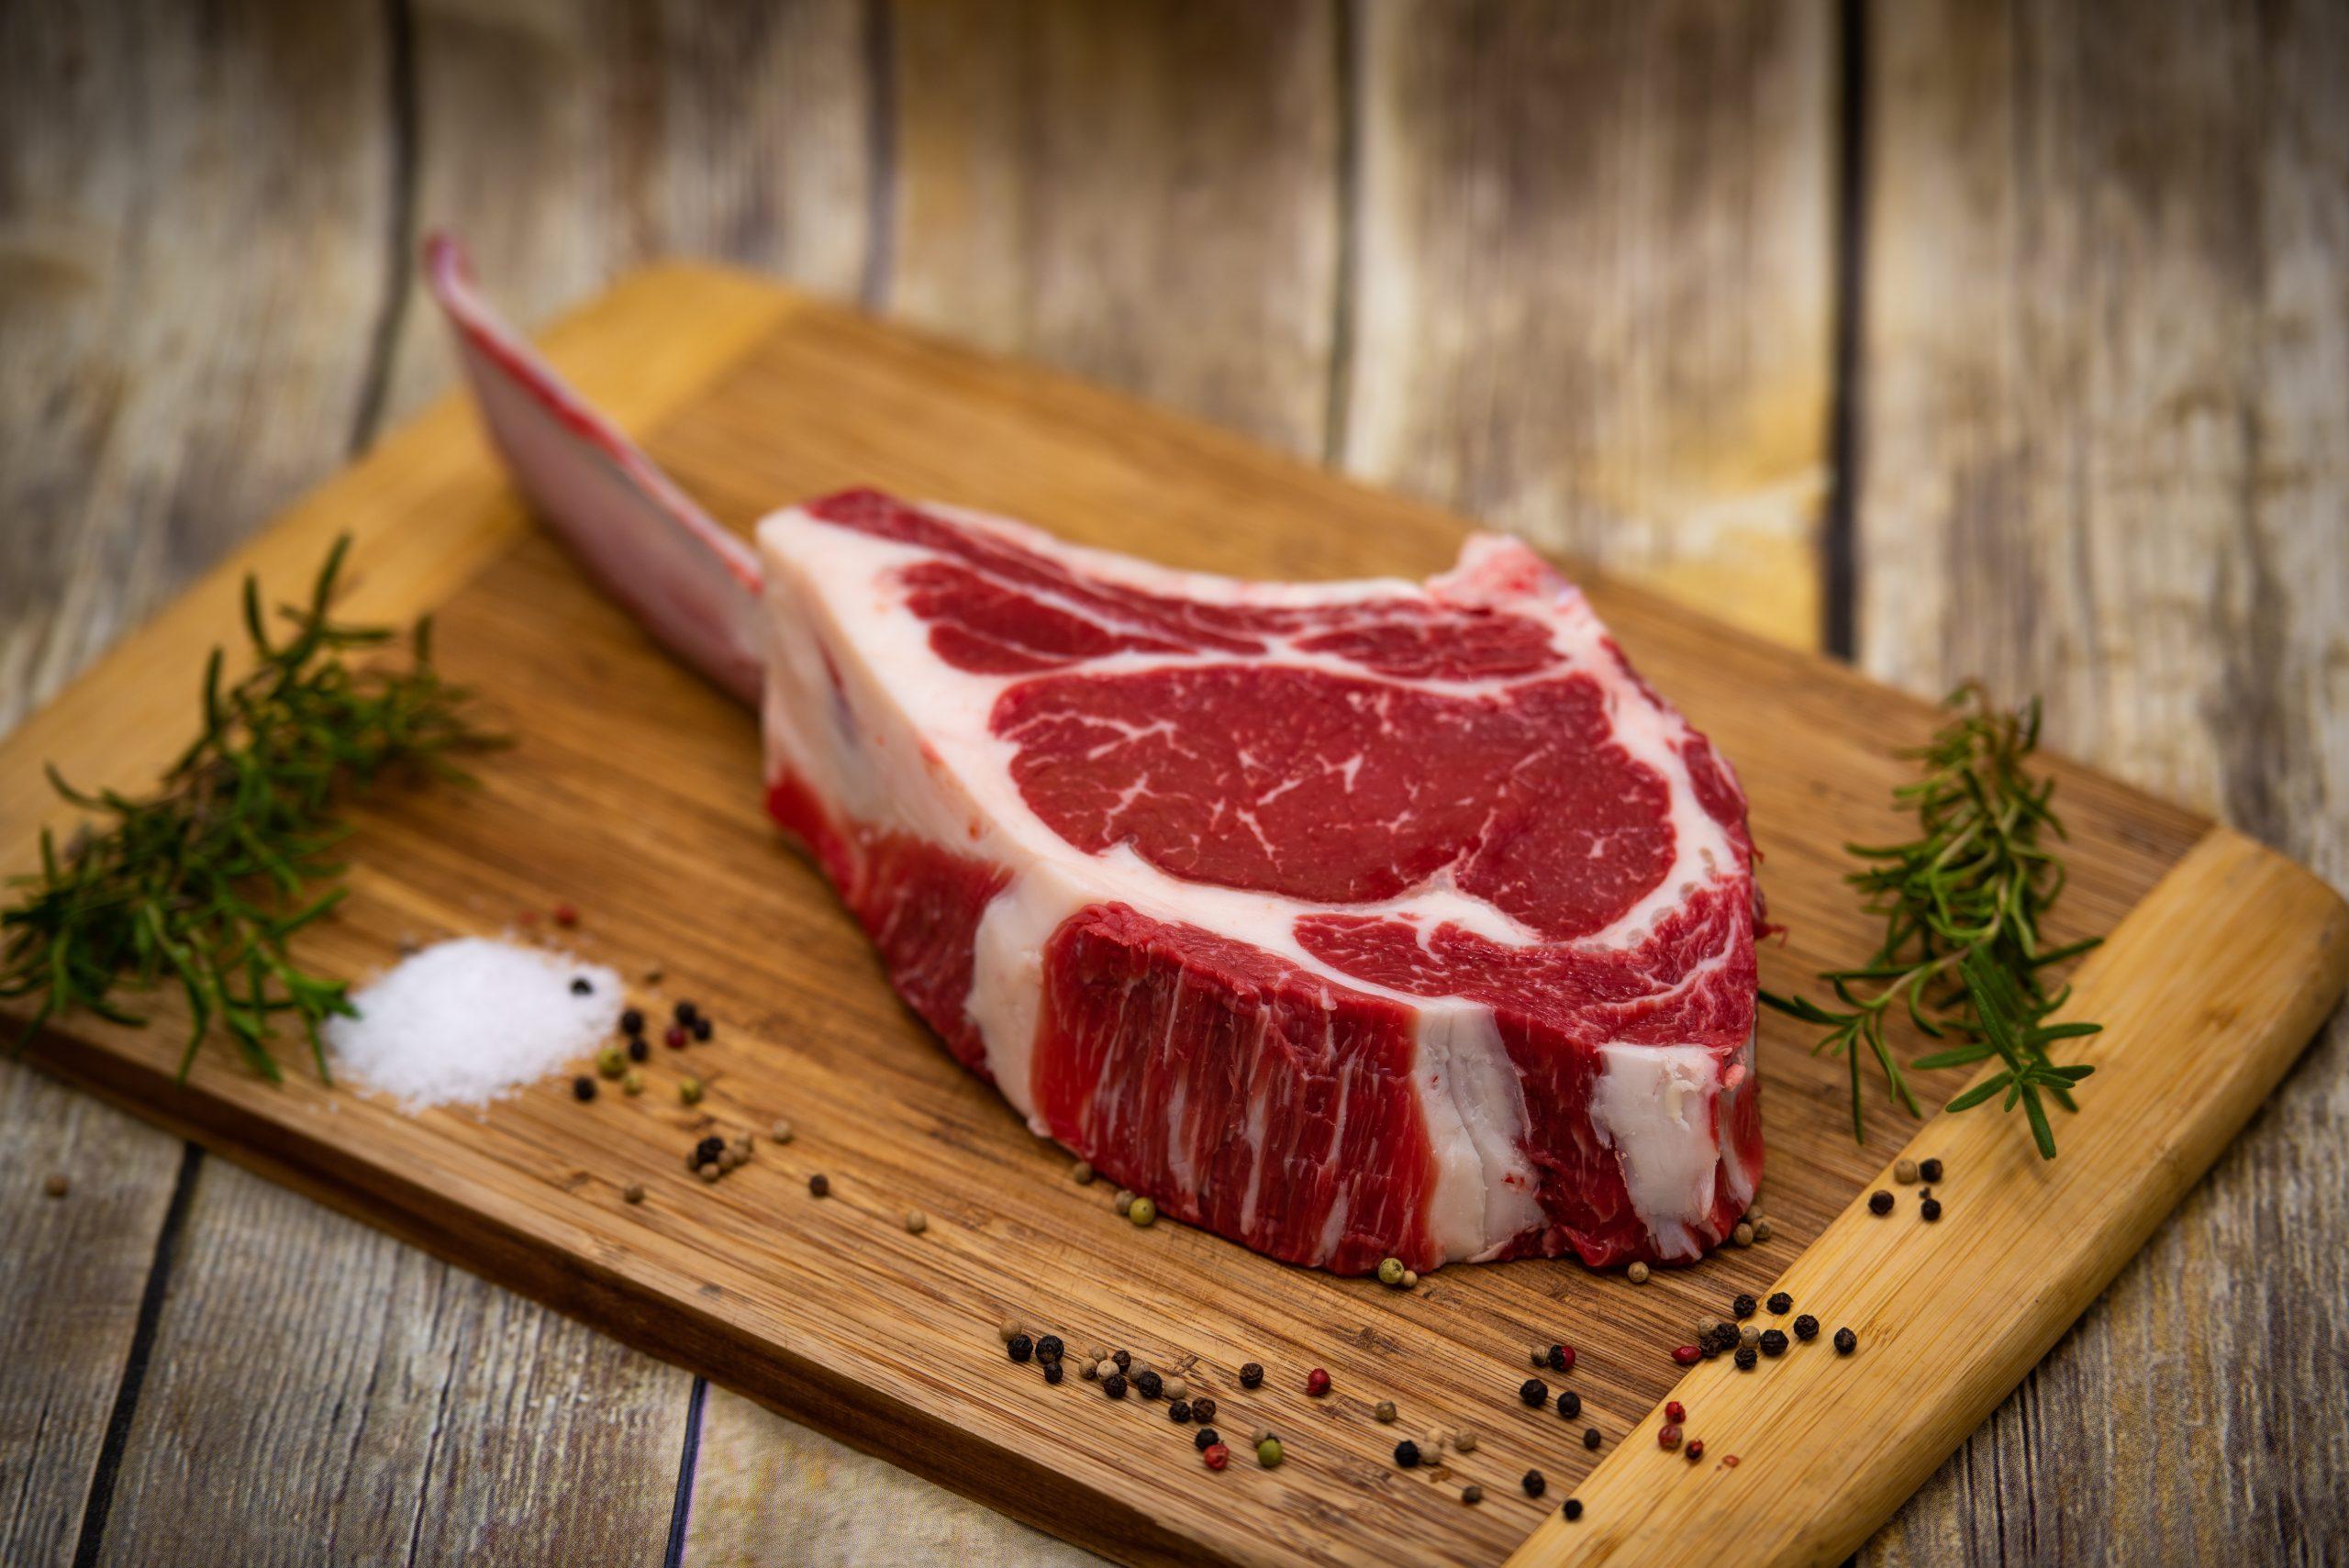 tomahawk-steak-2_44741723262_o